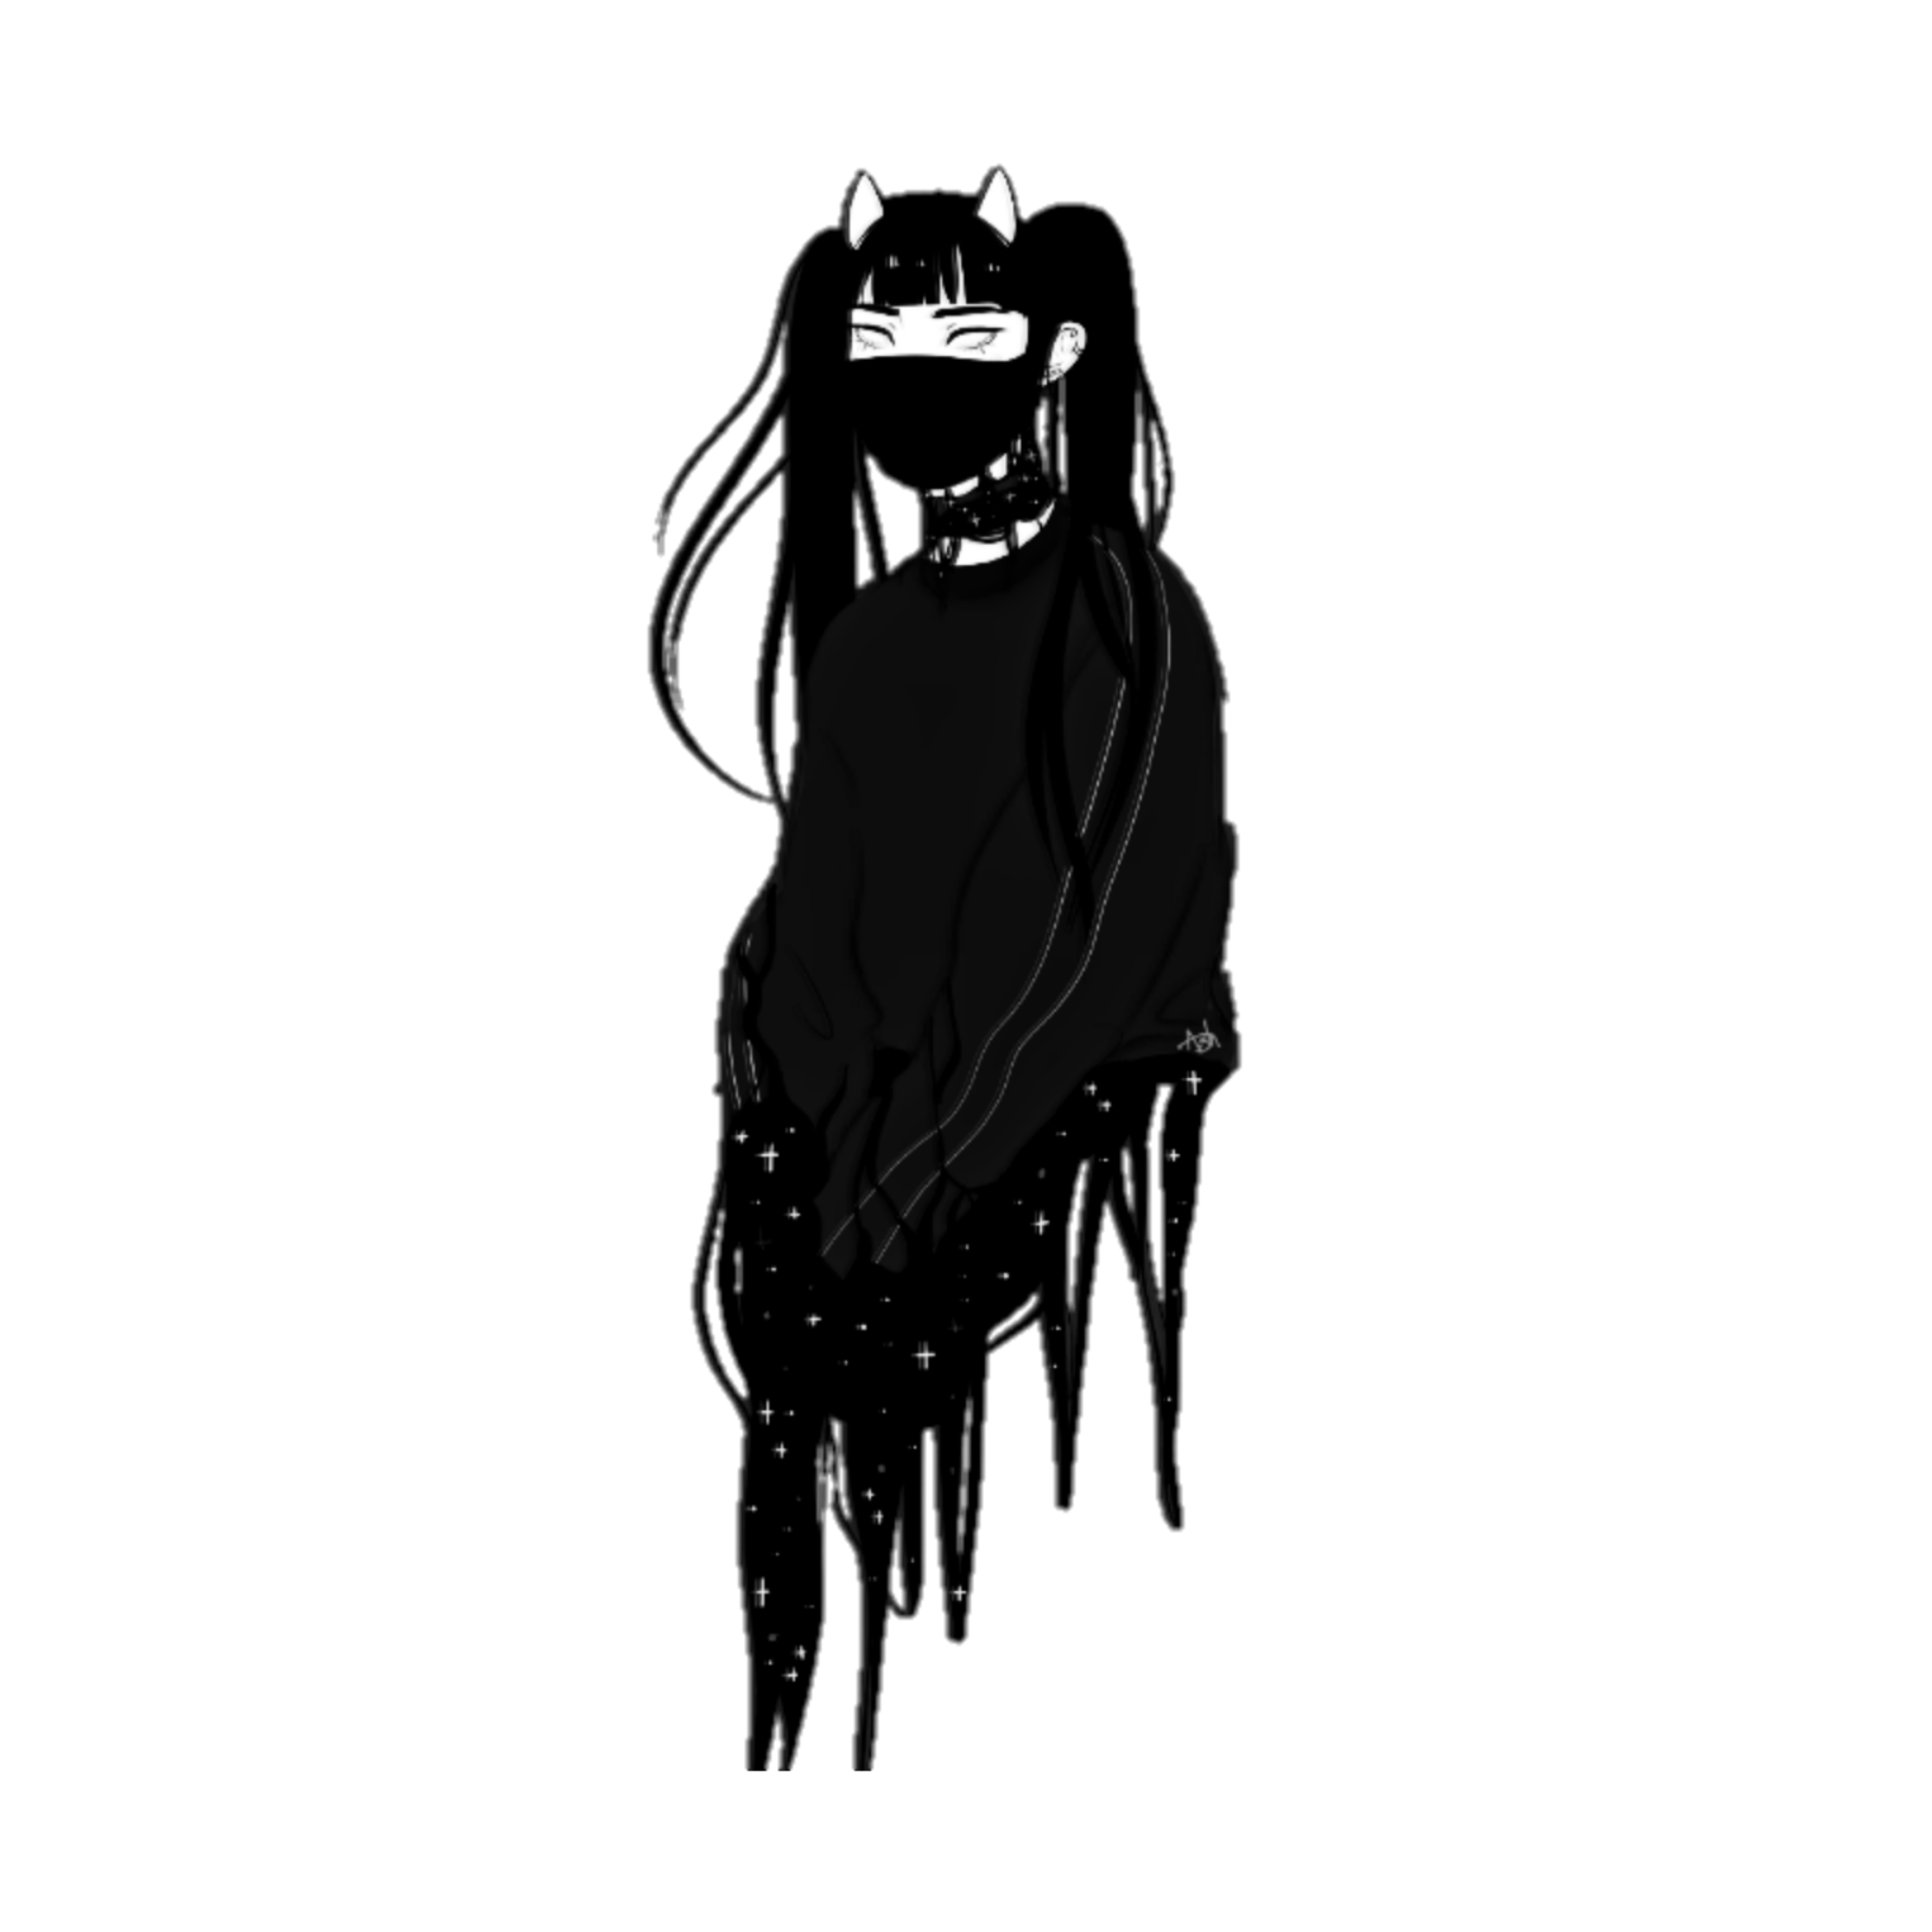 satan devil demon anime aesthetic dark freetoedit remix...